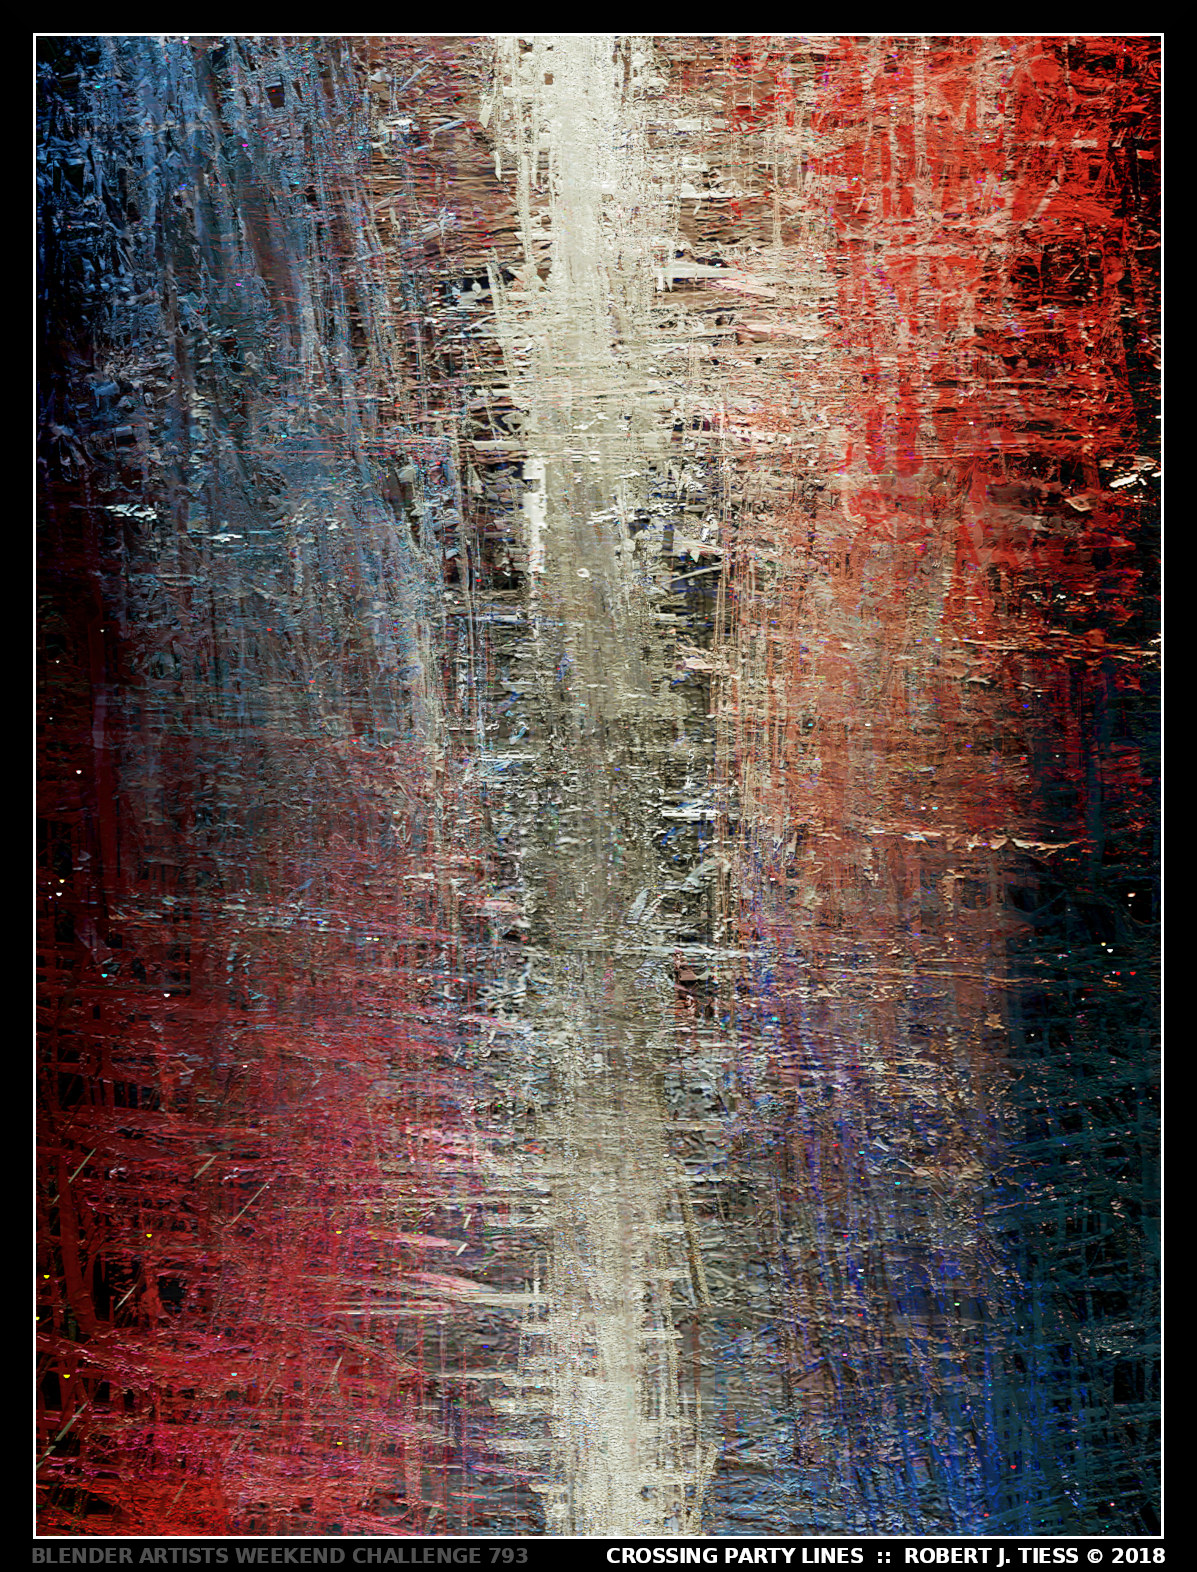 Crossing Party Lines - By Robert J. Tiess